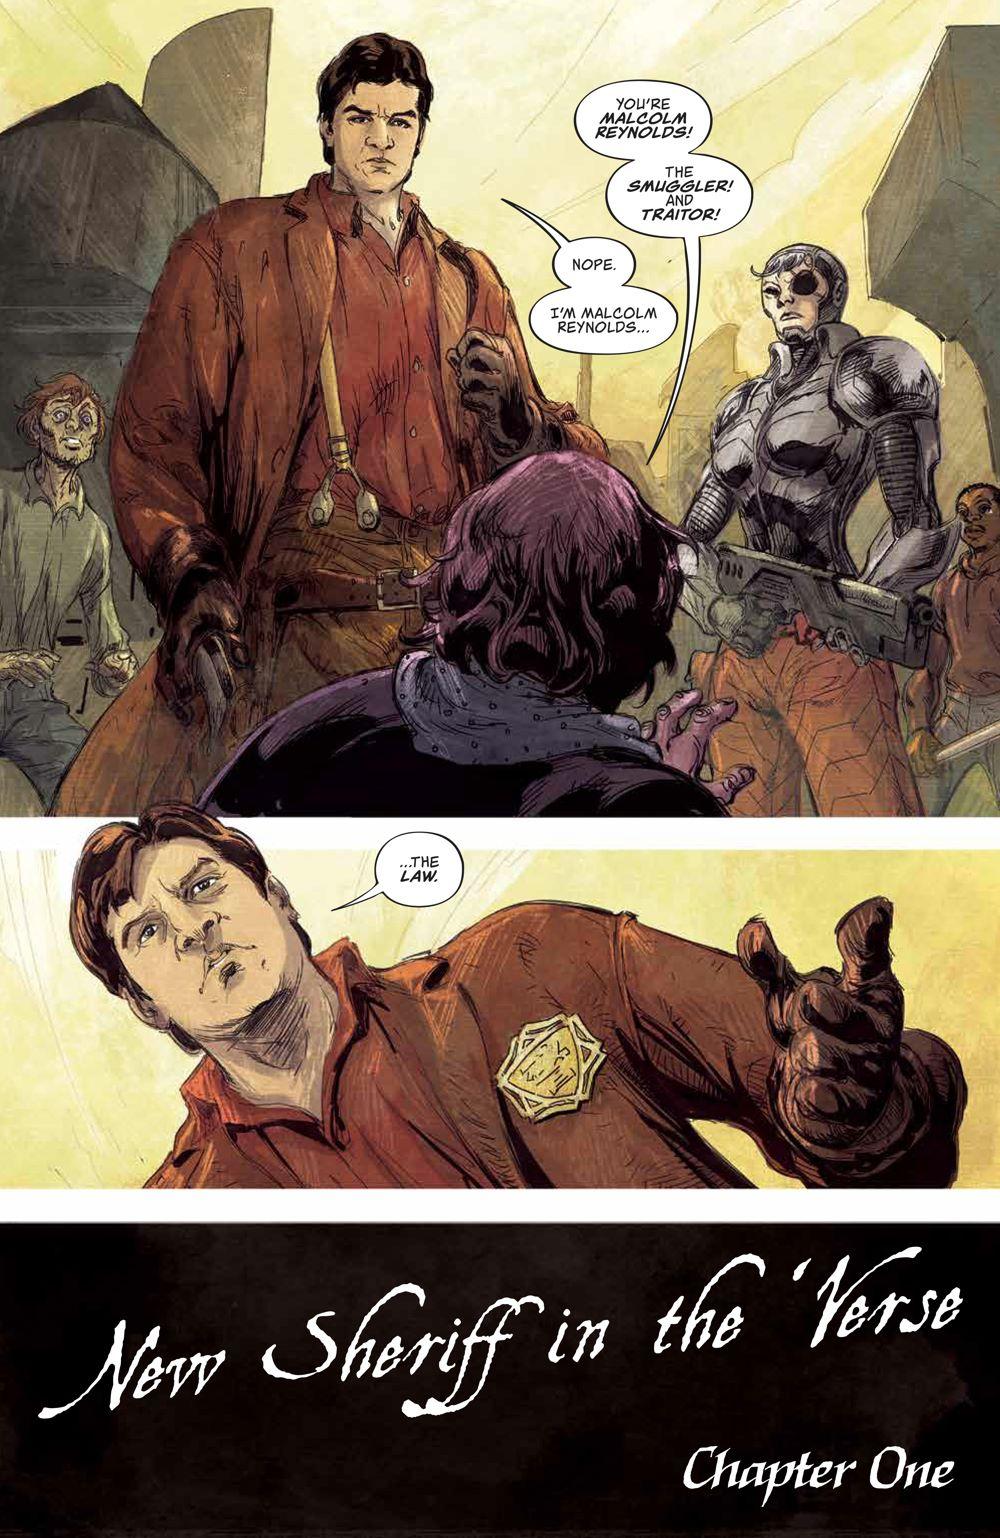 Firefly_NewSheriffVerse_v1_HC_PRESS_55 ComicList Previews: FIREFLY NEW SHERIFF IN THE 'VERSE VOLUME 1 HC